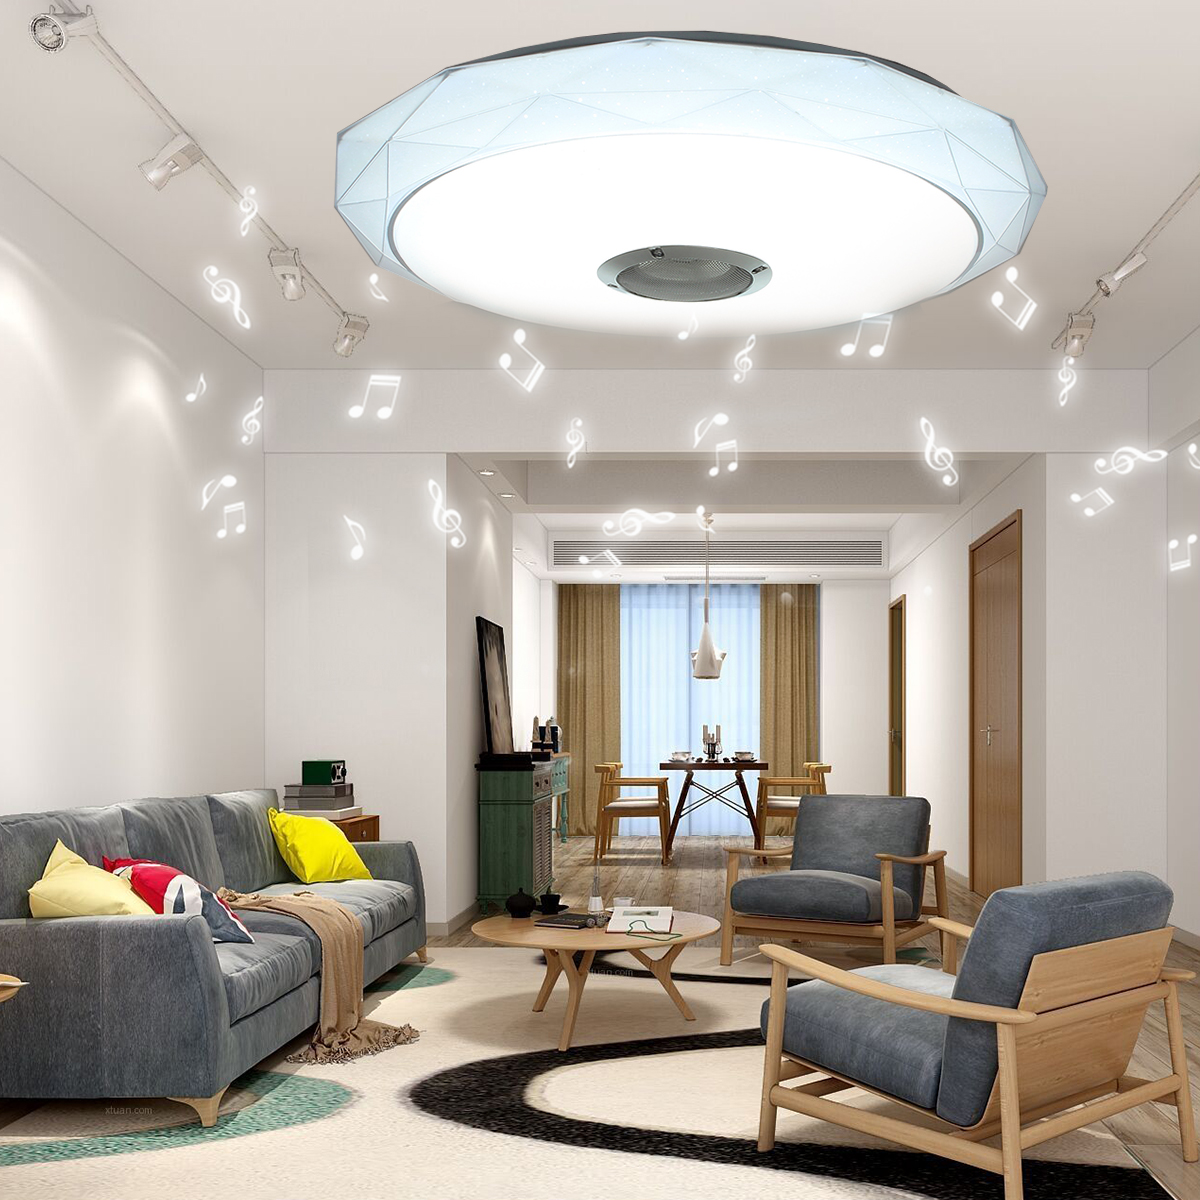 Dimmable LED Ceiling Lights Bluetooth Speaker Smart Remote Control RGB LED Music Loundspeaker Lamp Living Room Bedroom Fixture